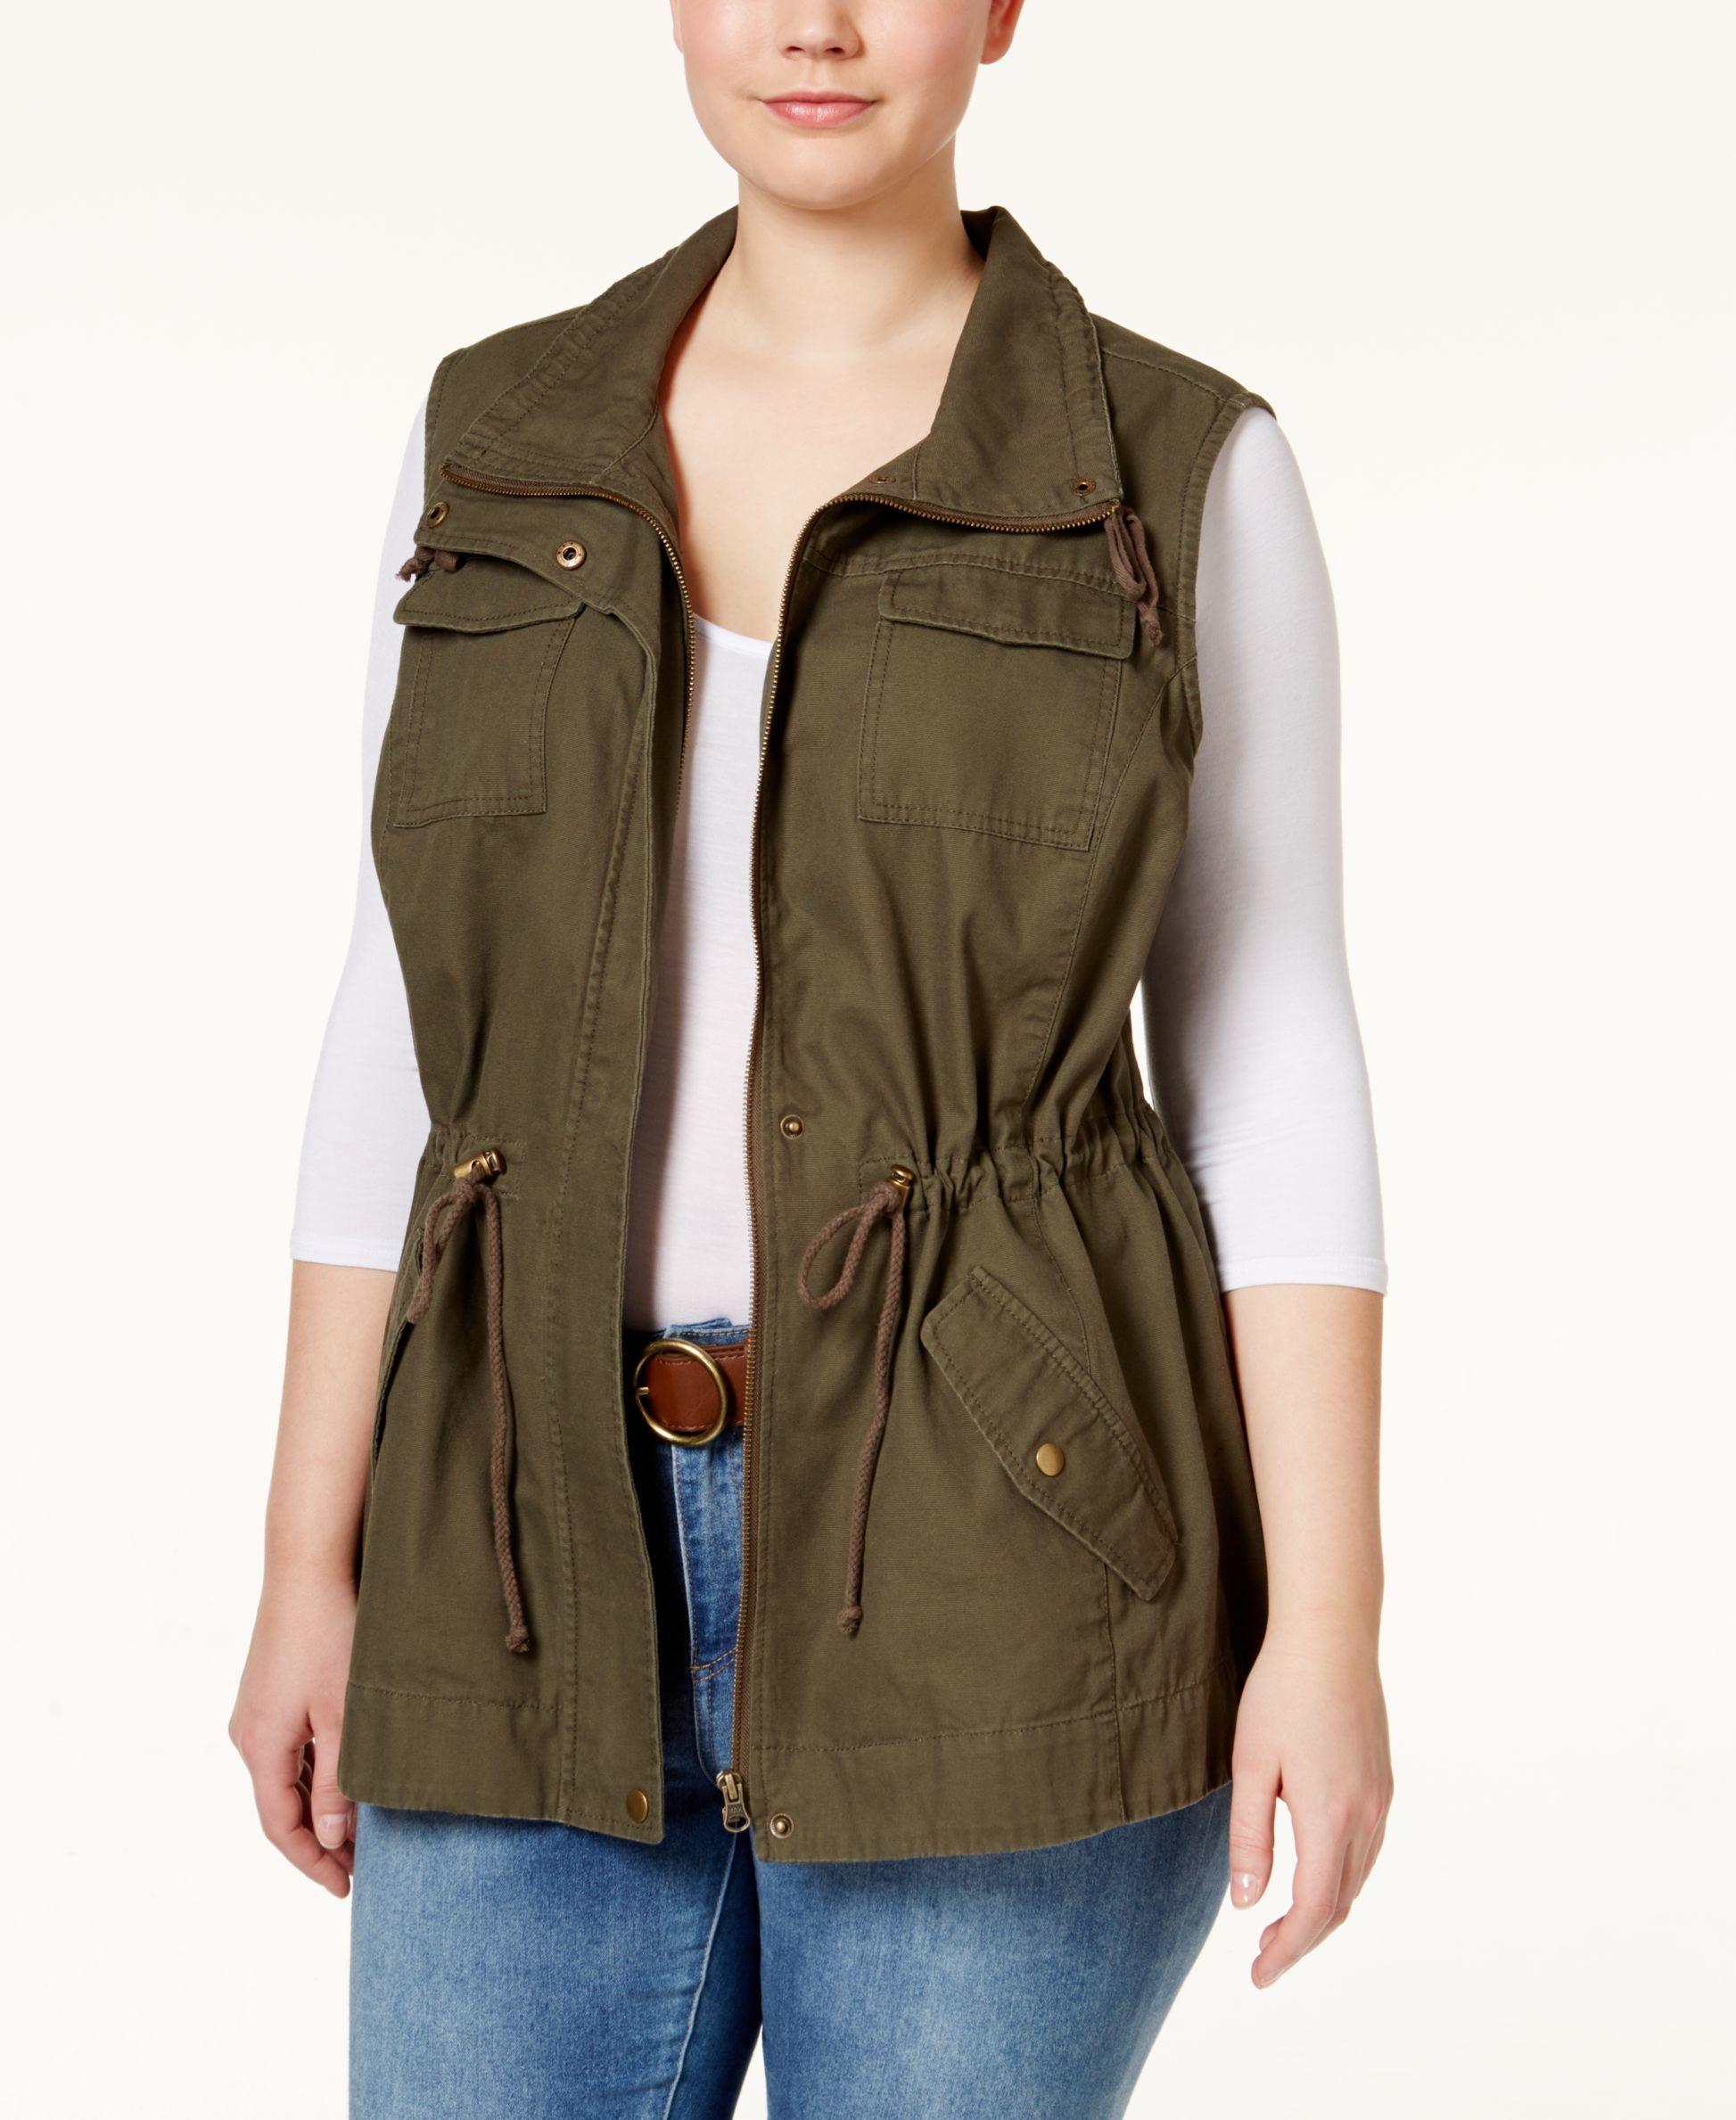 6463e9dad66 American Rag Plus Size Utility Vest